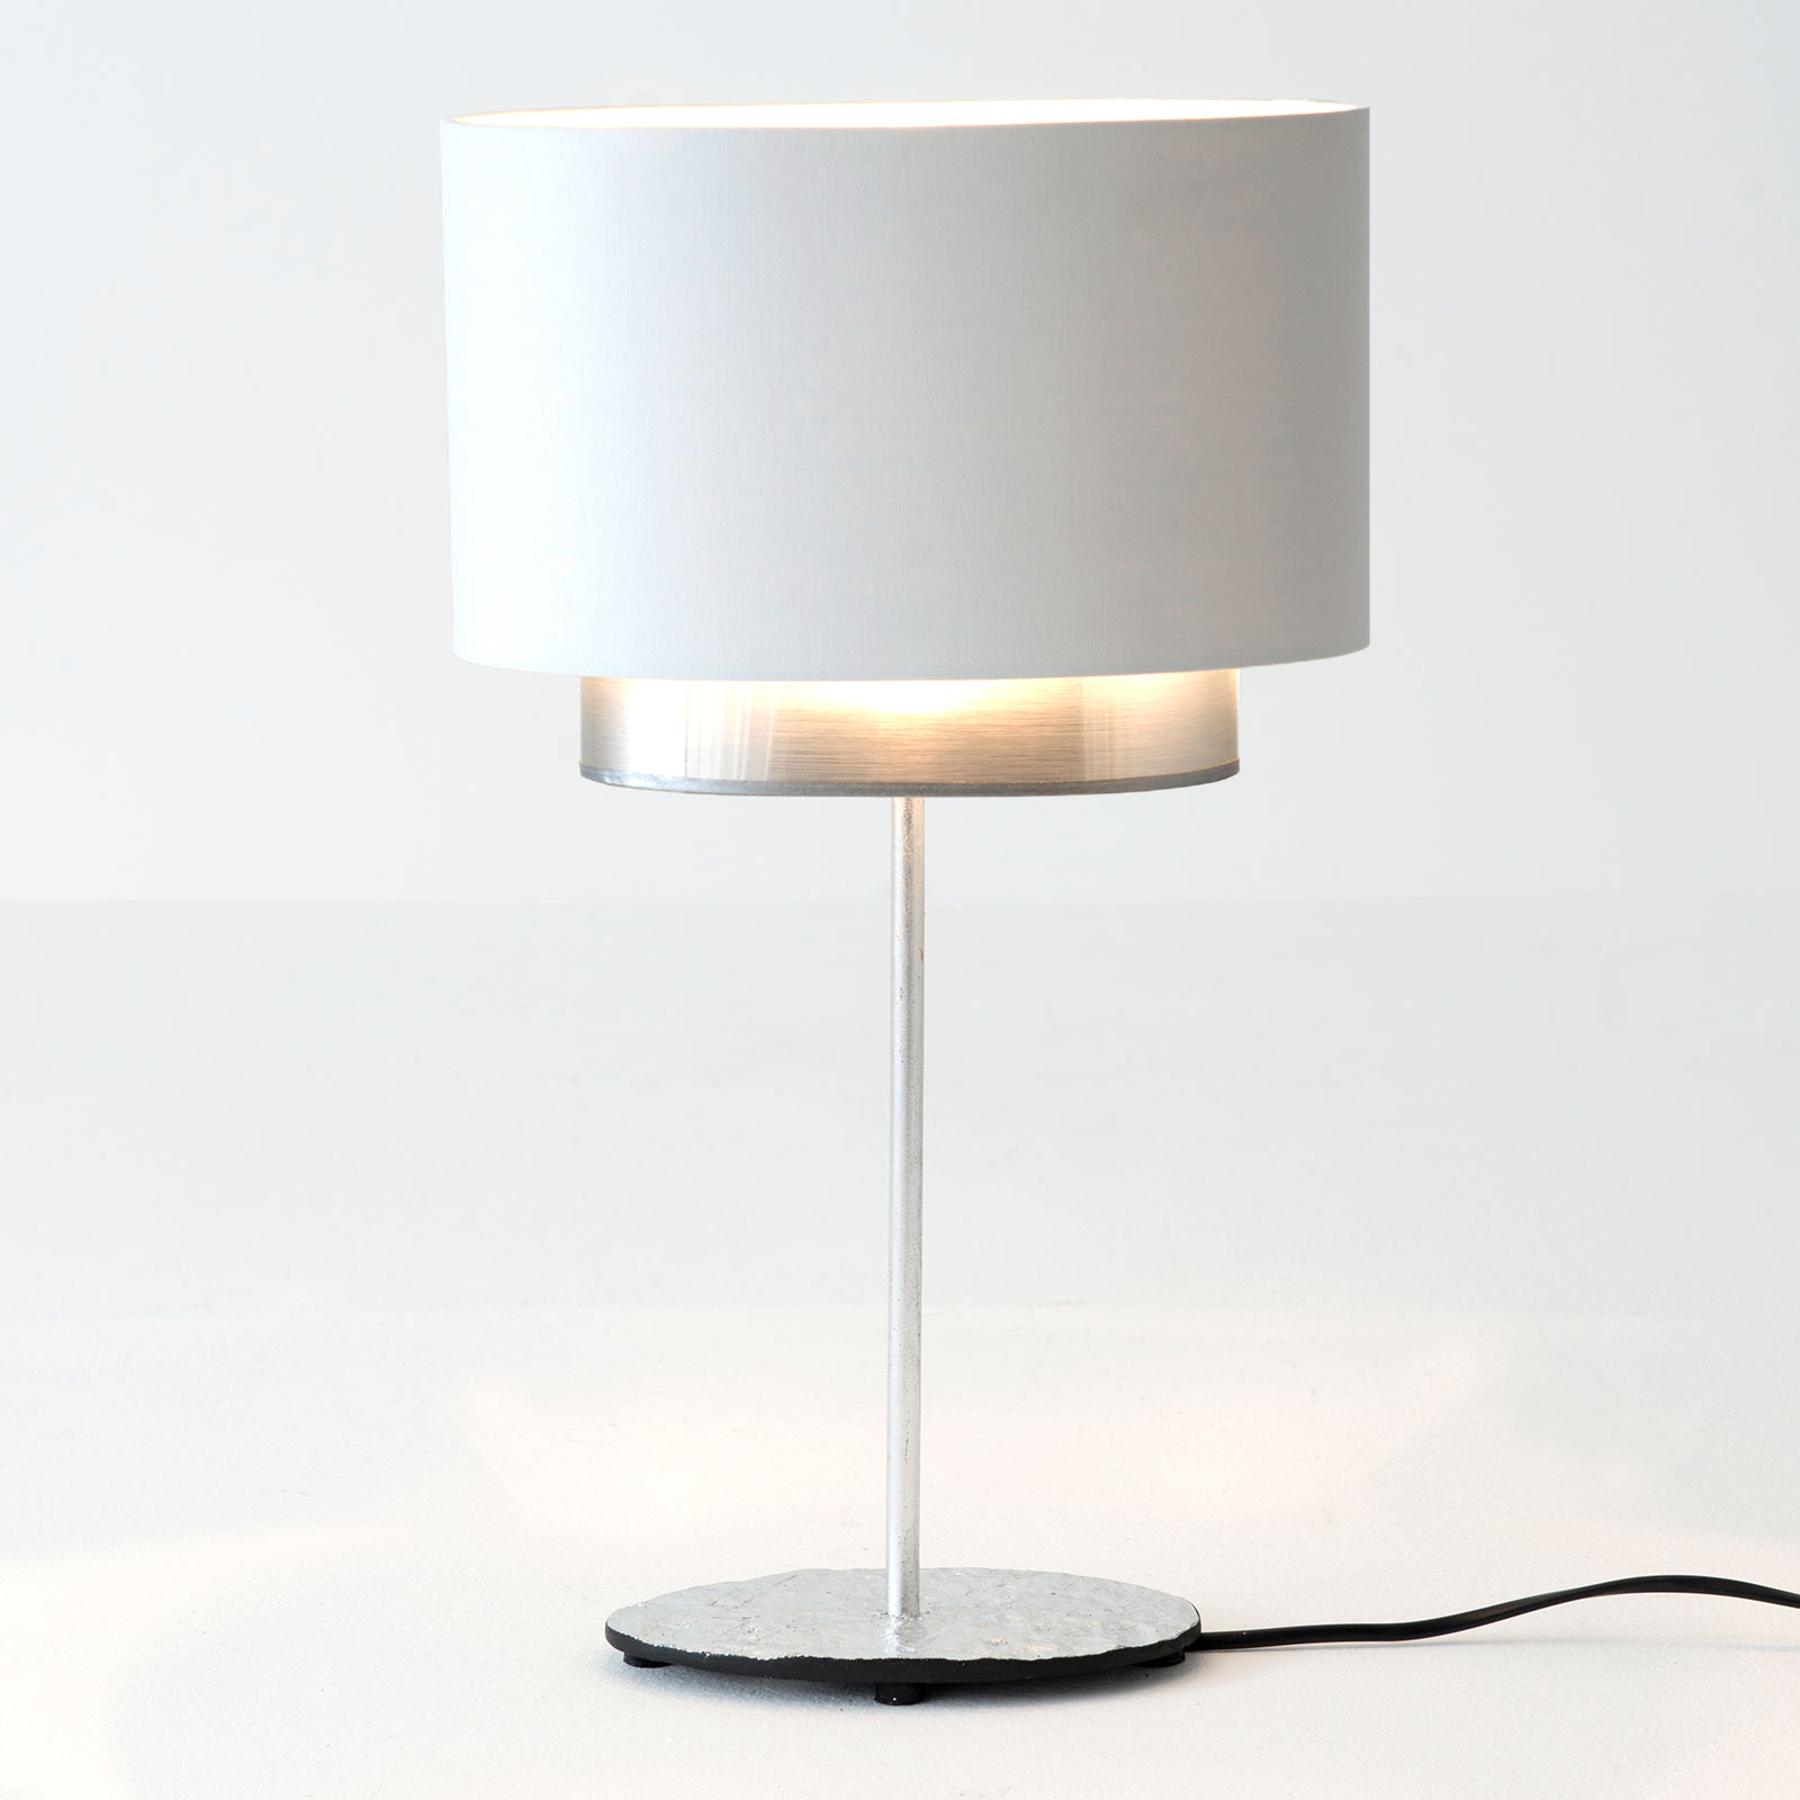 Tafellamp Mattia, ovaal, dubbel, wit/zilver